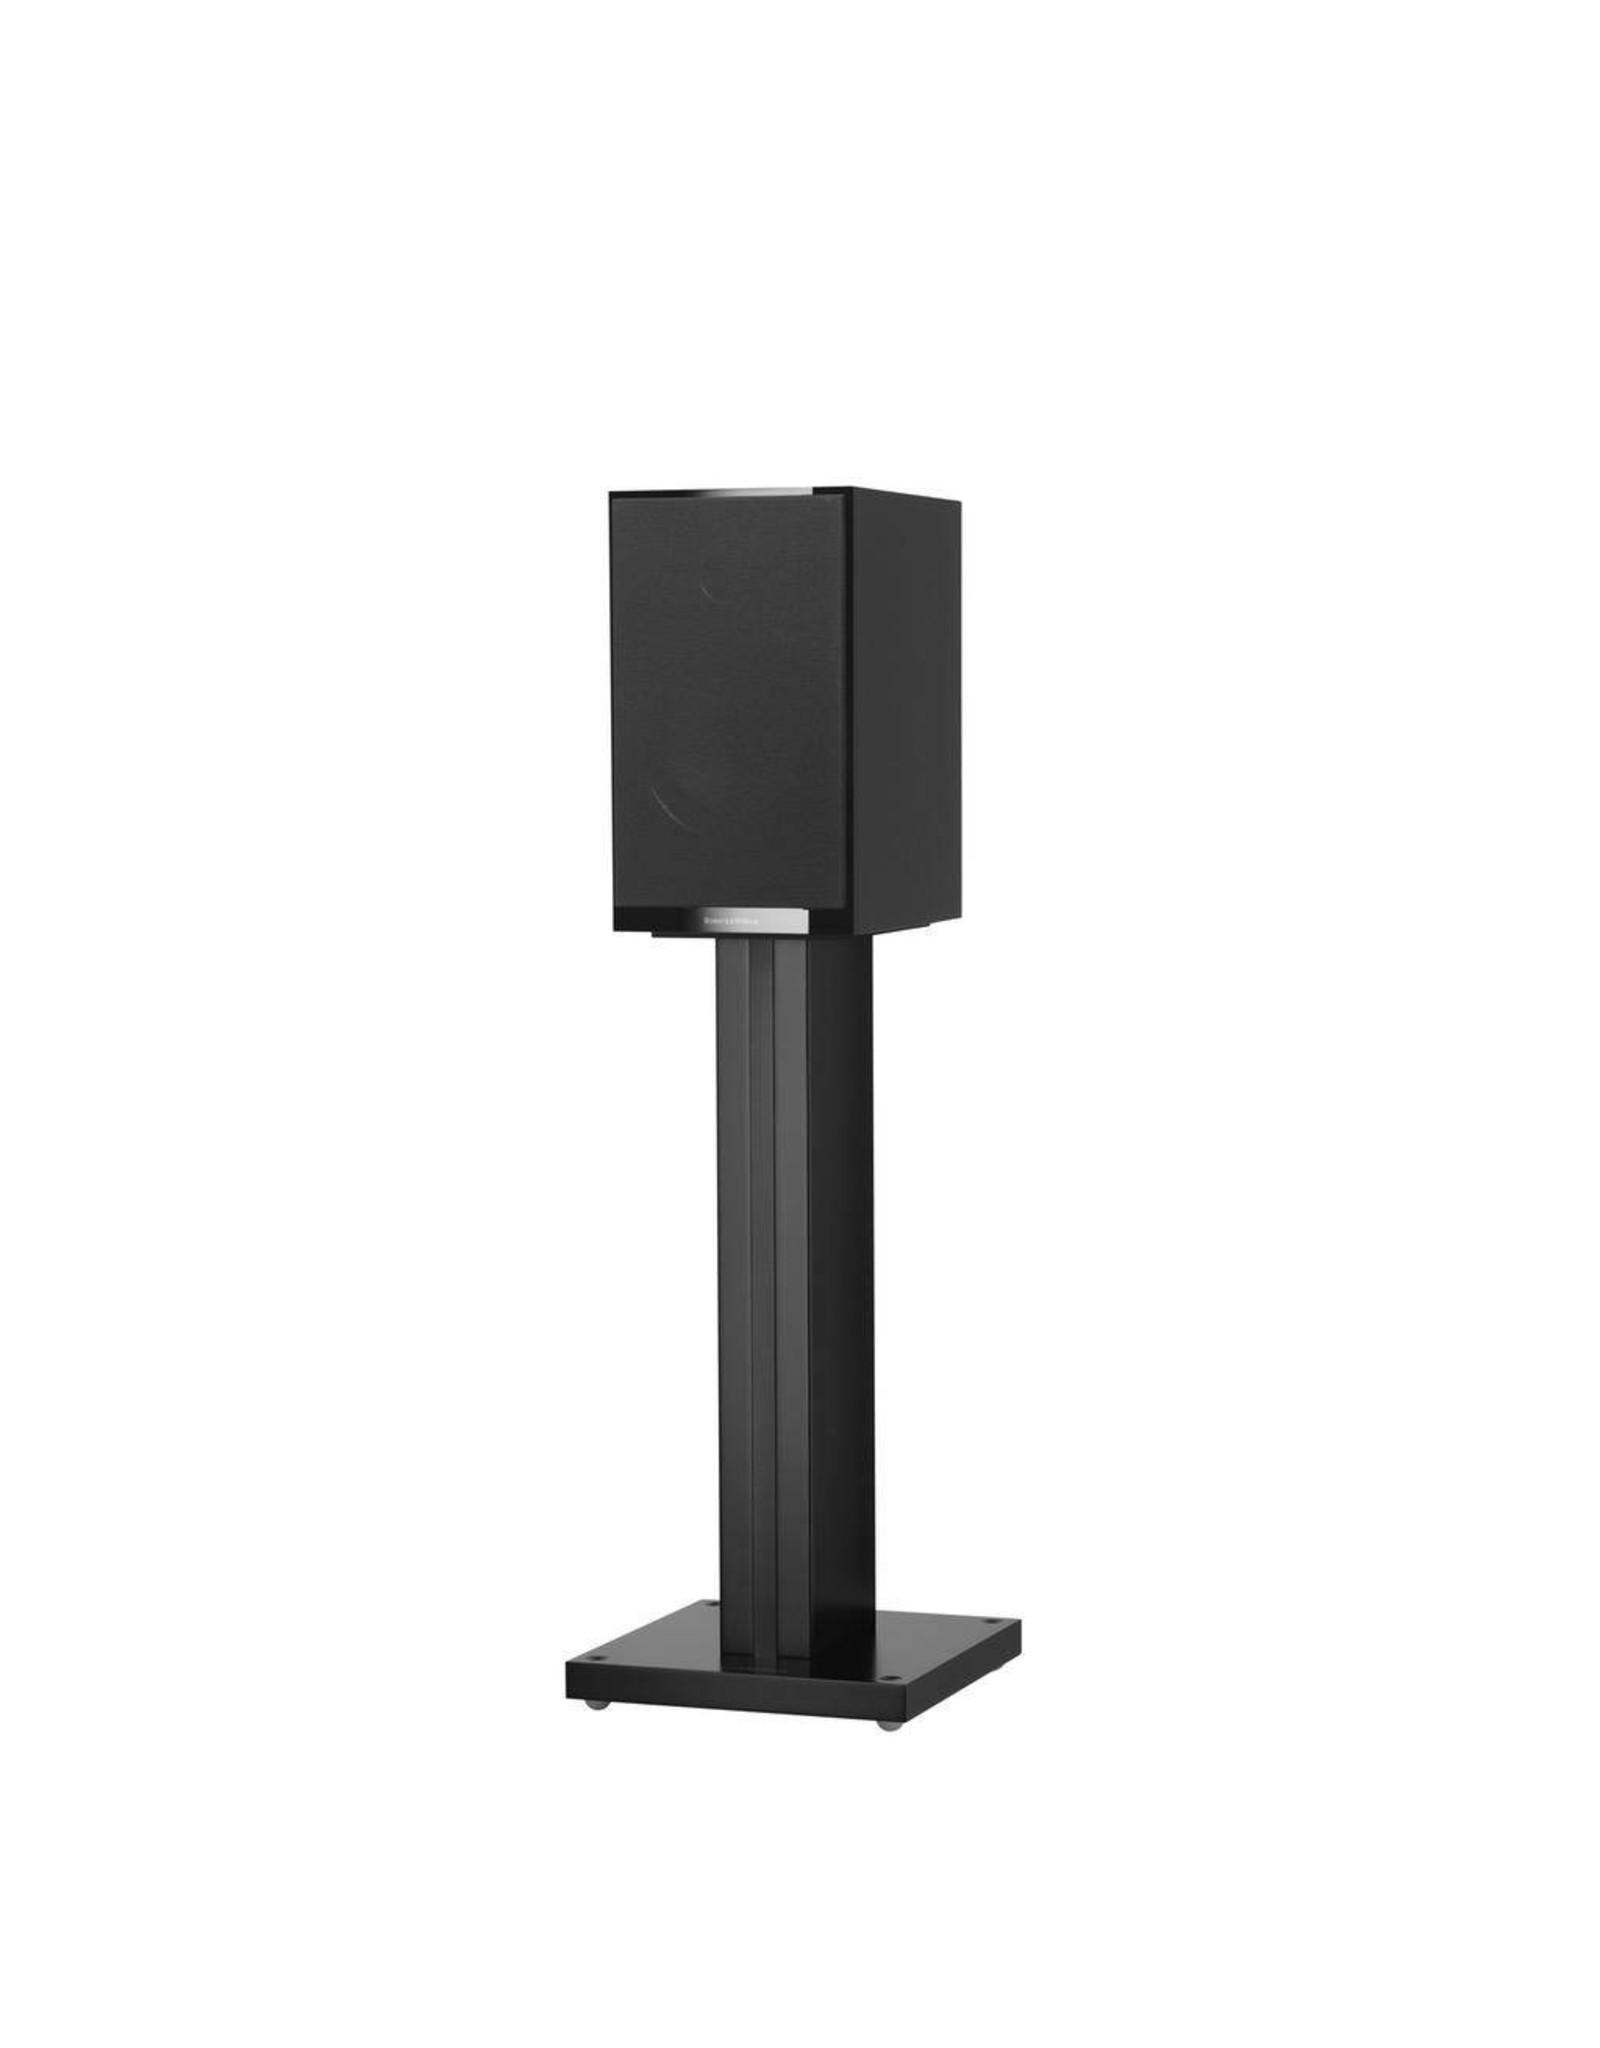 BOWERS & WILKINS B&W 706 S2 2-Way Shelf/Stand Mount Speakers (pair)